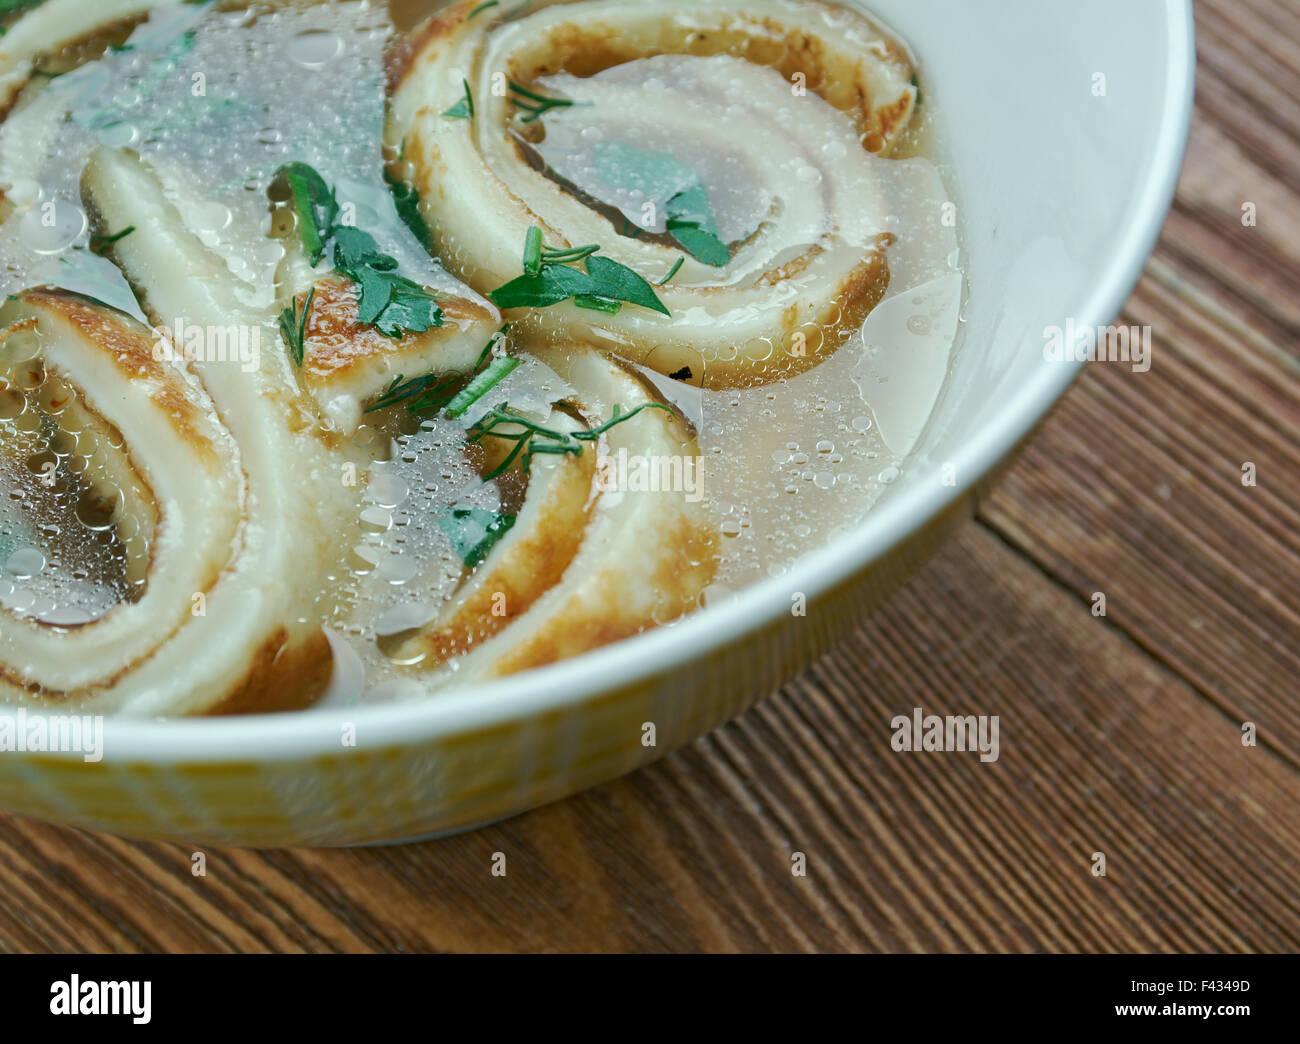 Pfannkuchensuppe - Stock Image